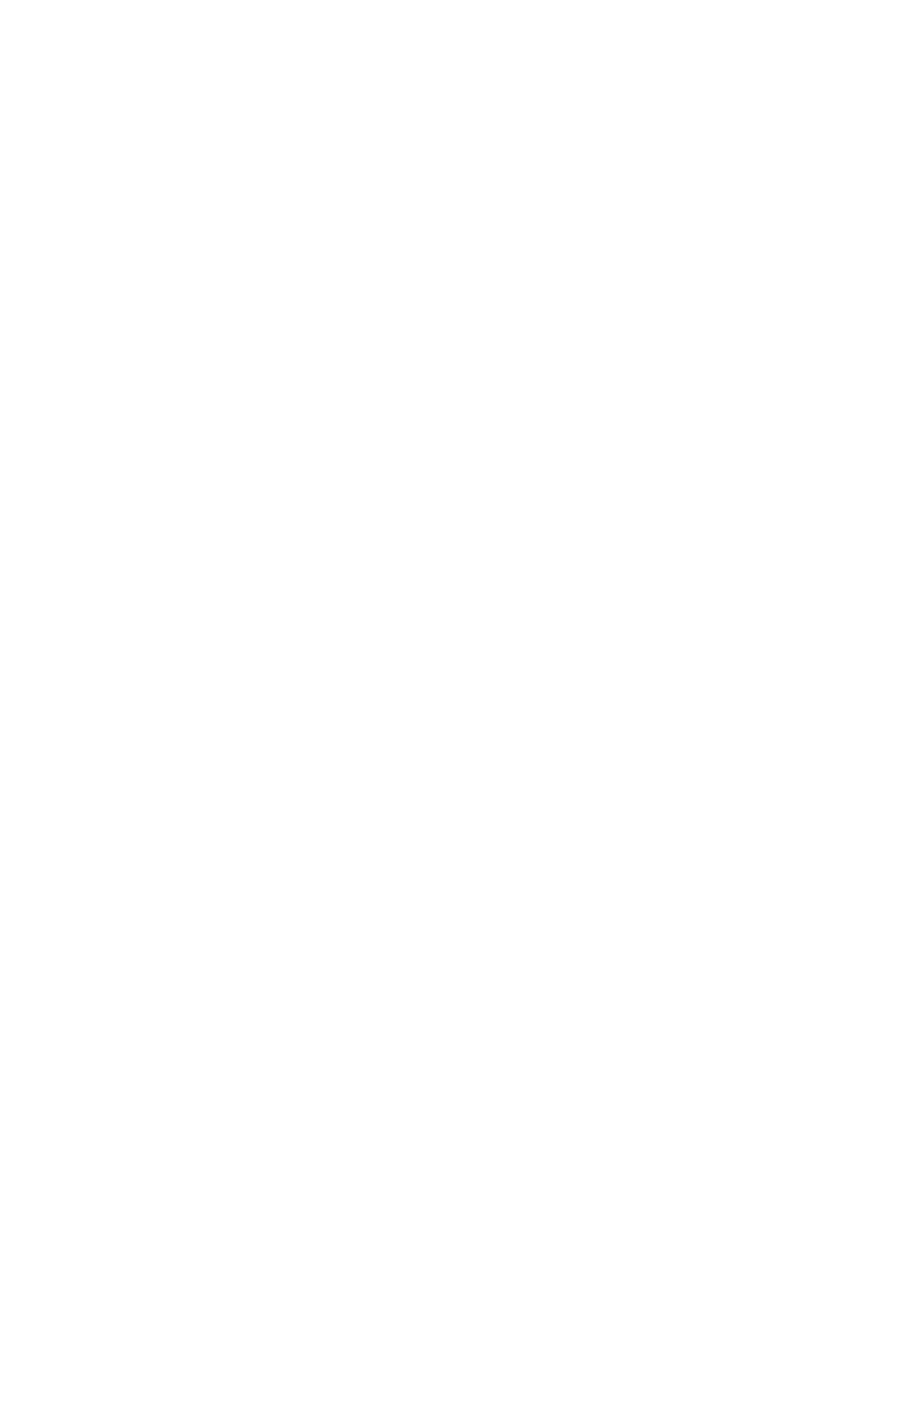 aff1b0c5-bdfc-4a34-93fd-0403414cef60